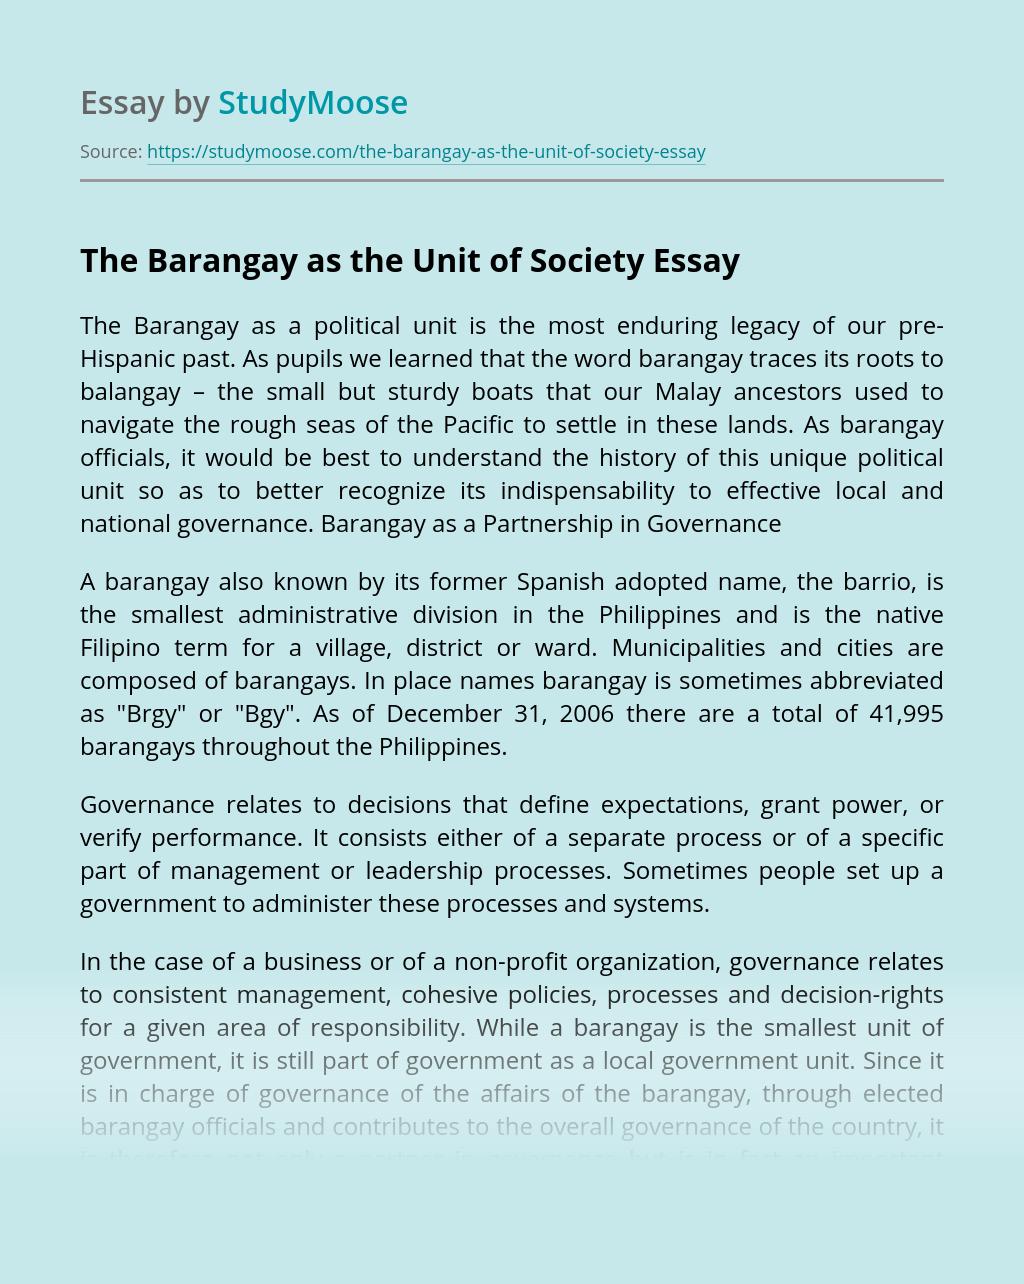 The Barangay as the Unit of Society